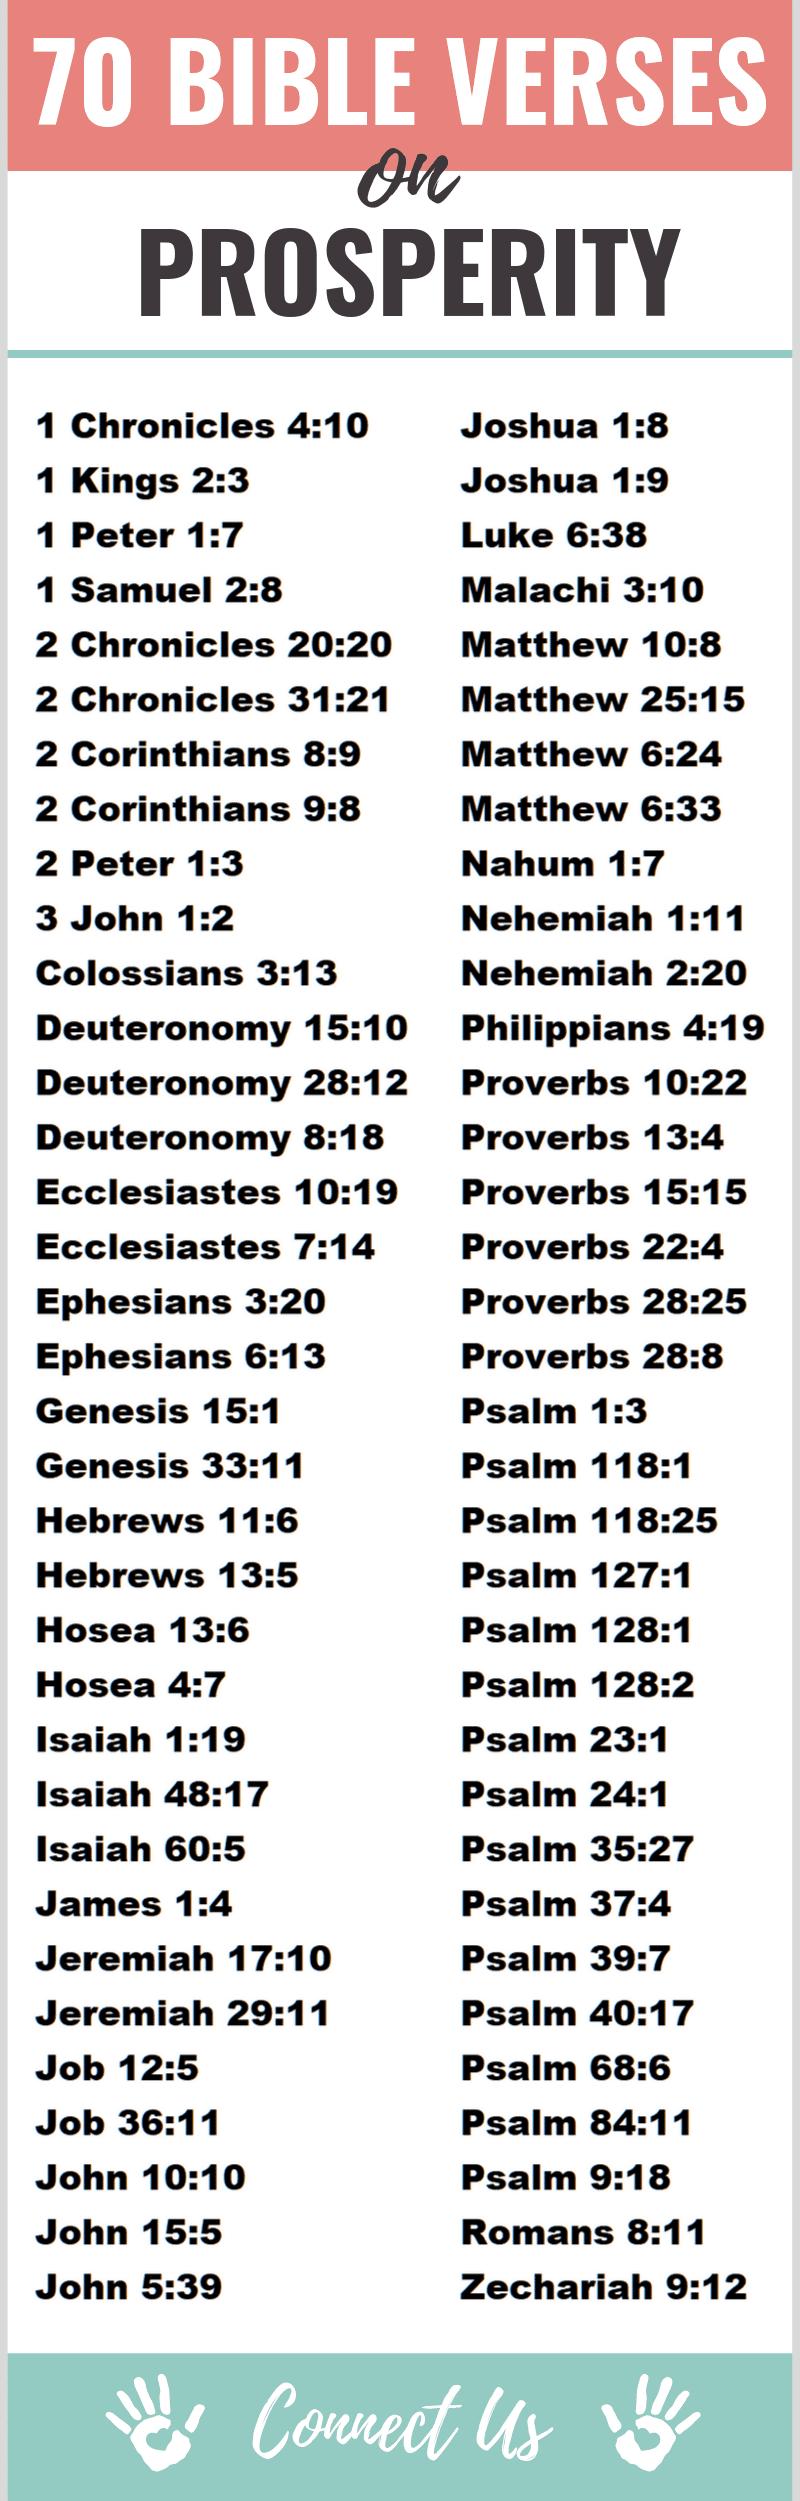 Bible Verses on Prosperity